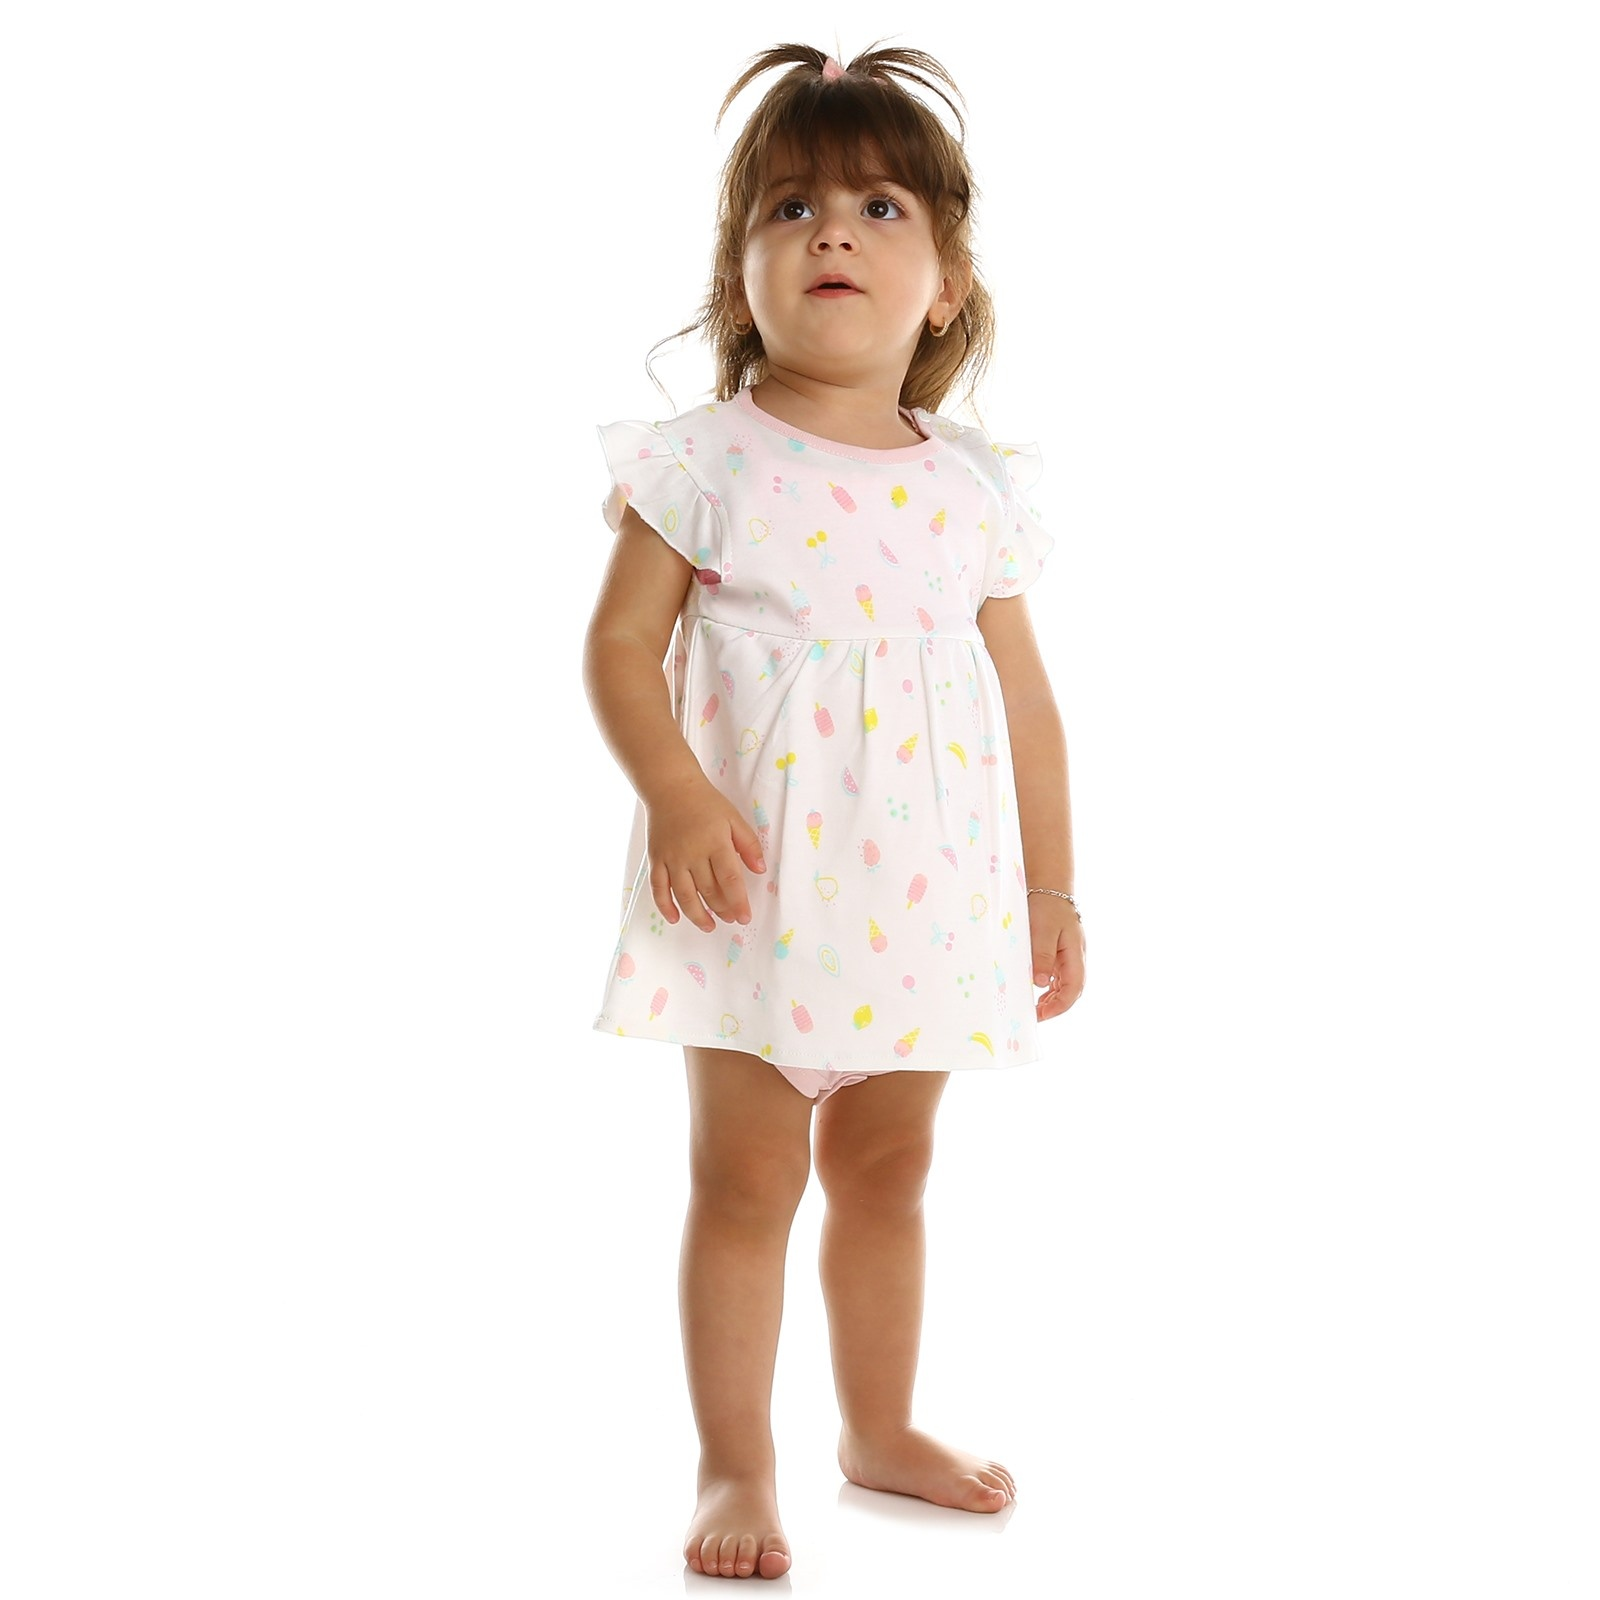 Ebebek HelloBaby Summer Baby Sweet Fruits Dress Bodysuit